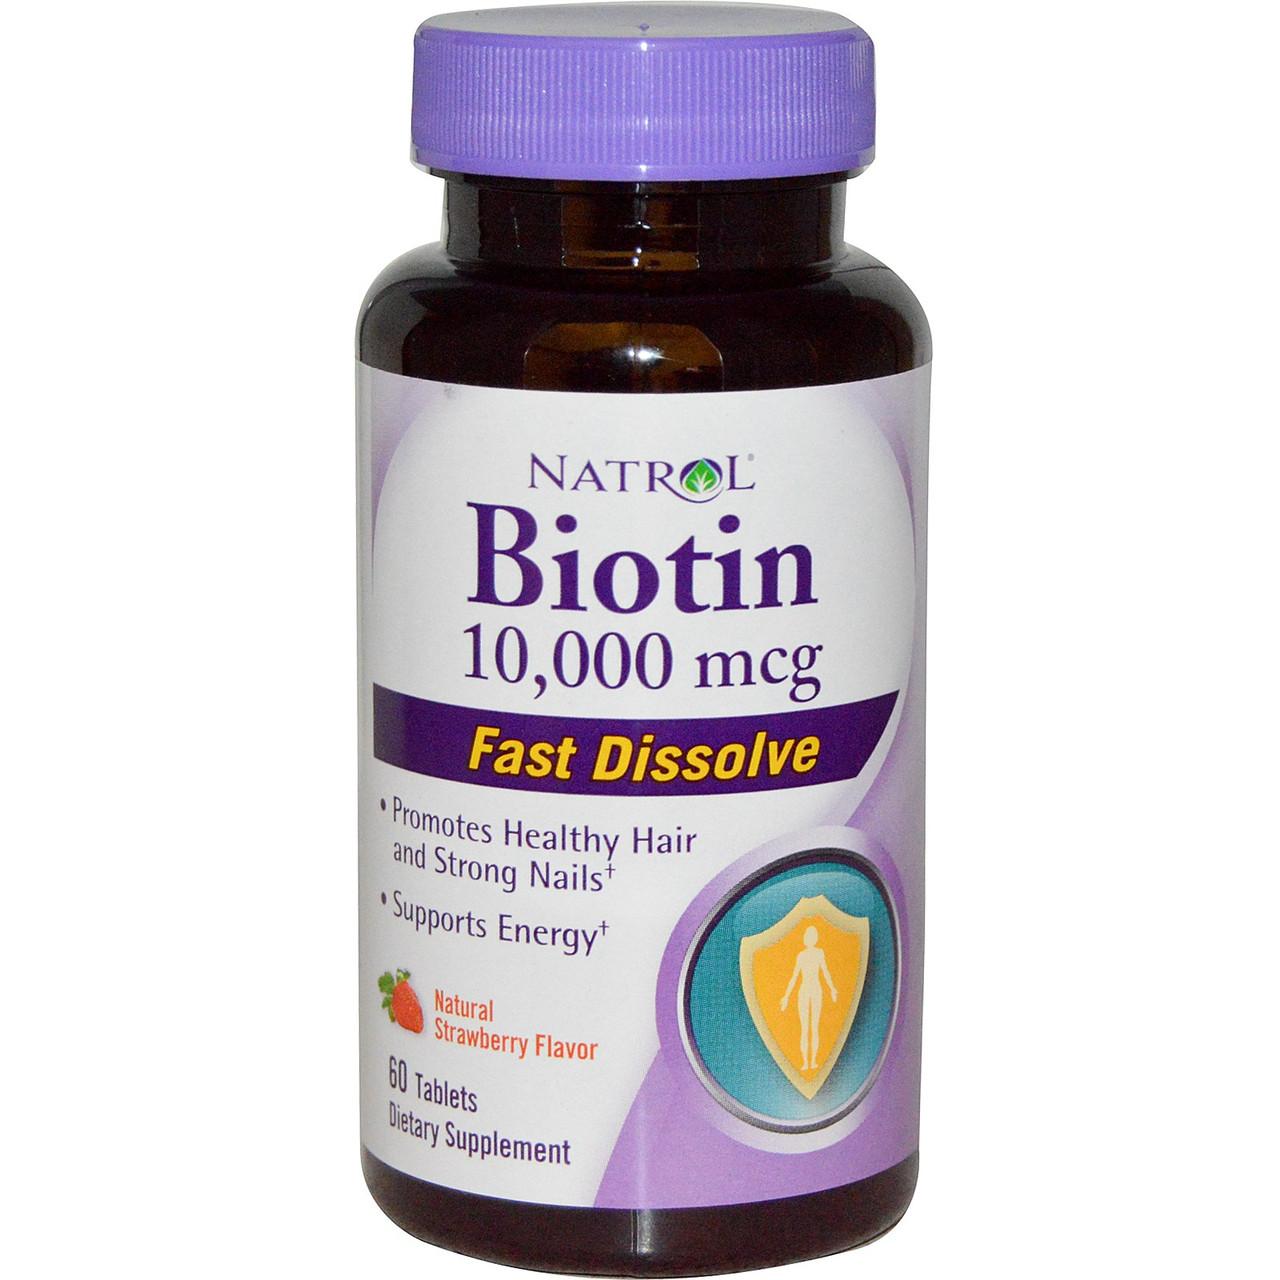 Биотин Natrol быстрорастворимый, 10.000 мкг, 60 таблеток